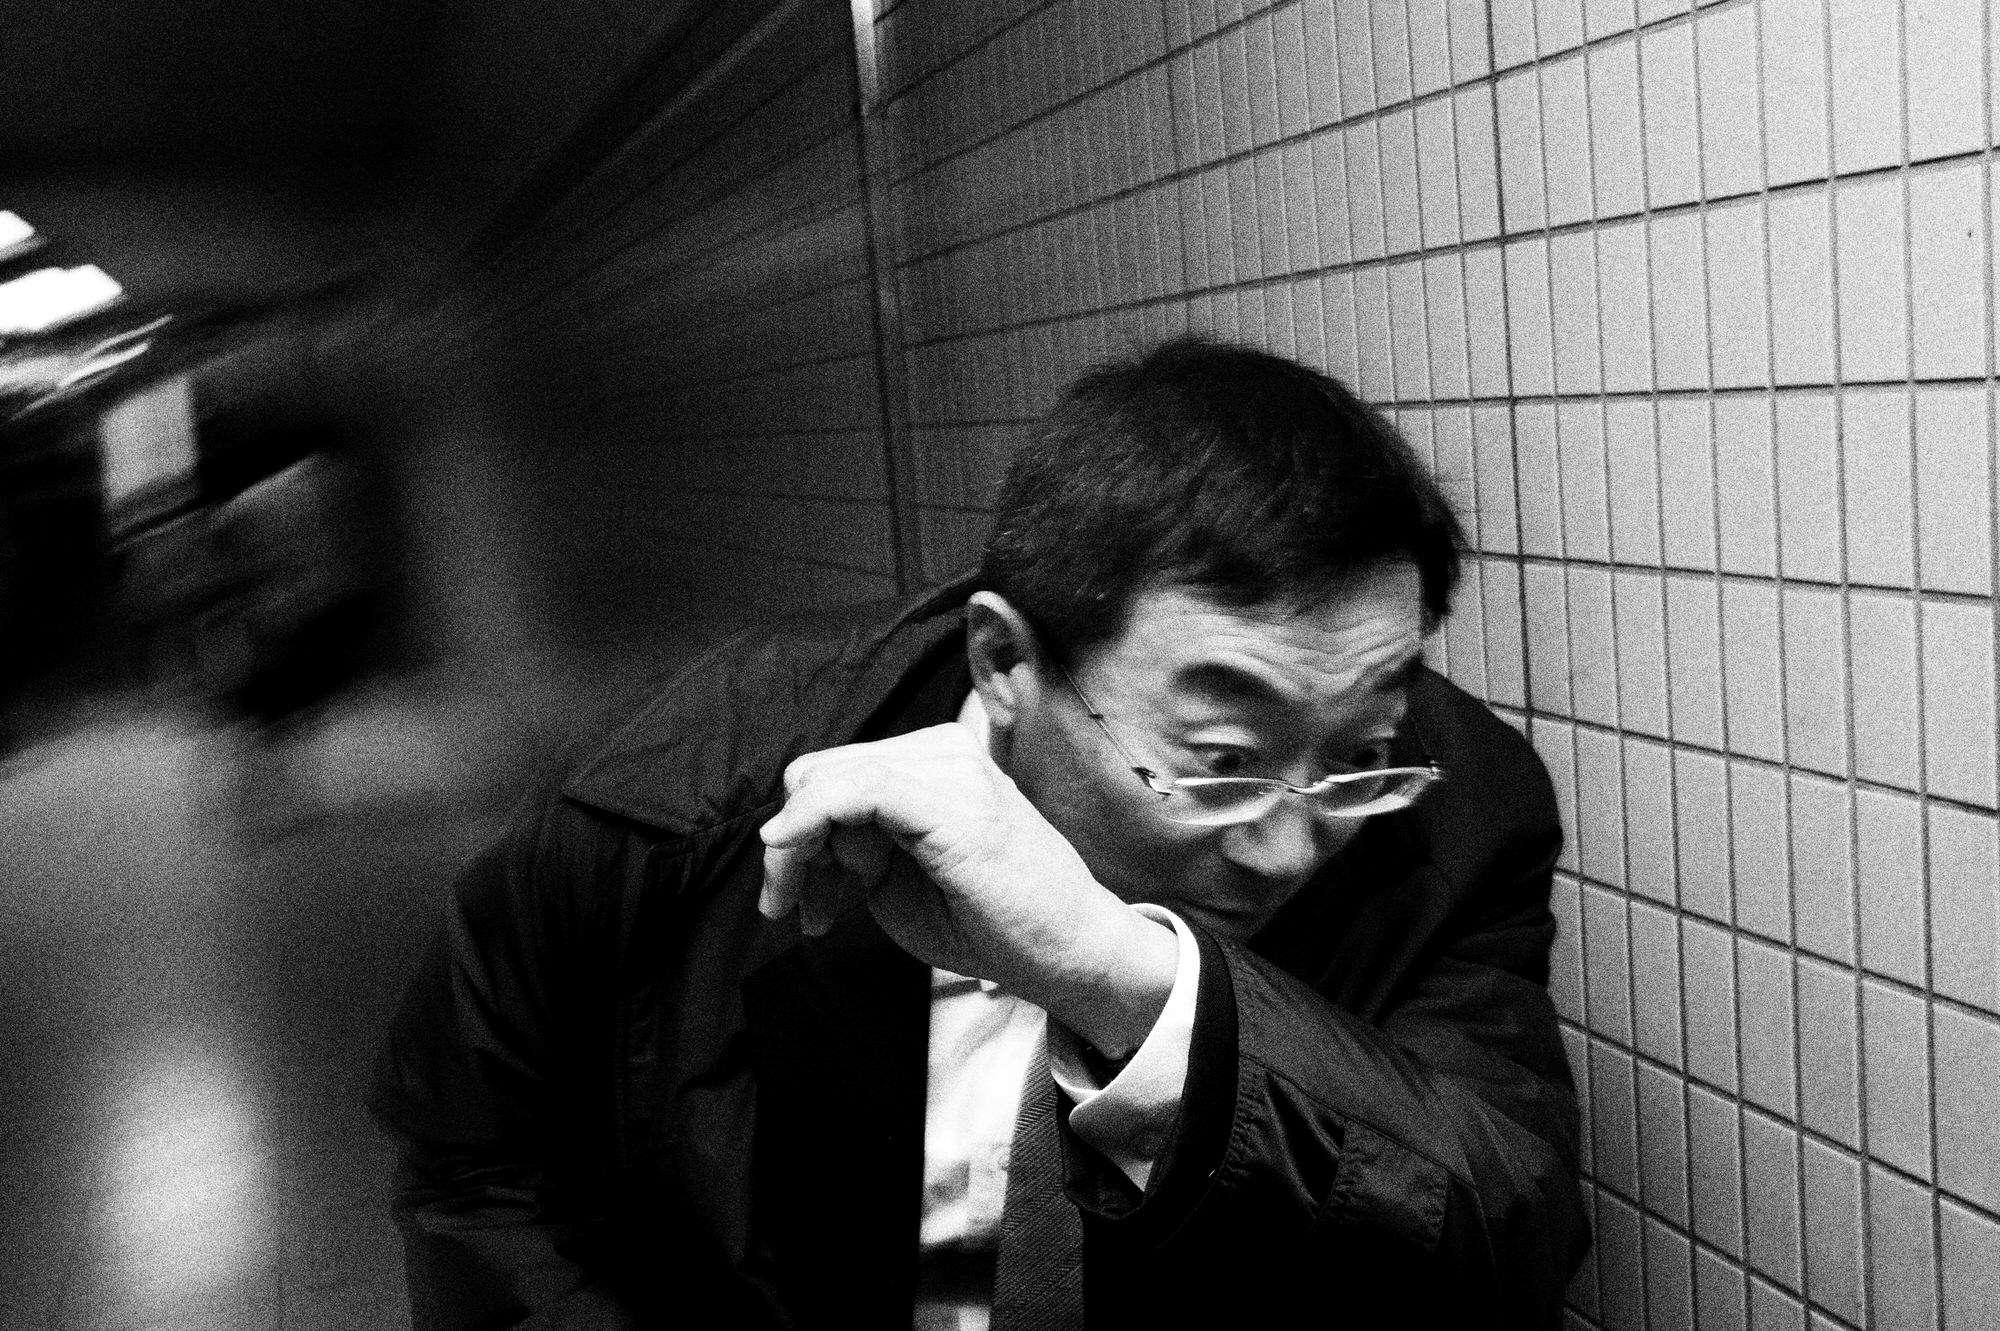 Tokyo, 2011